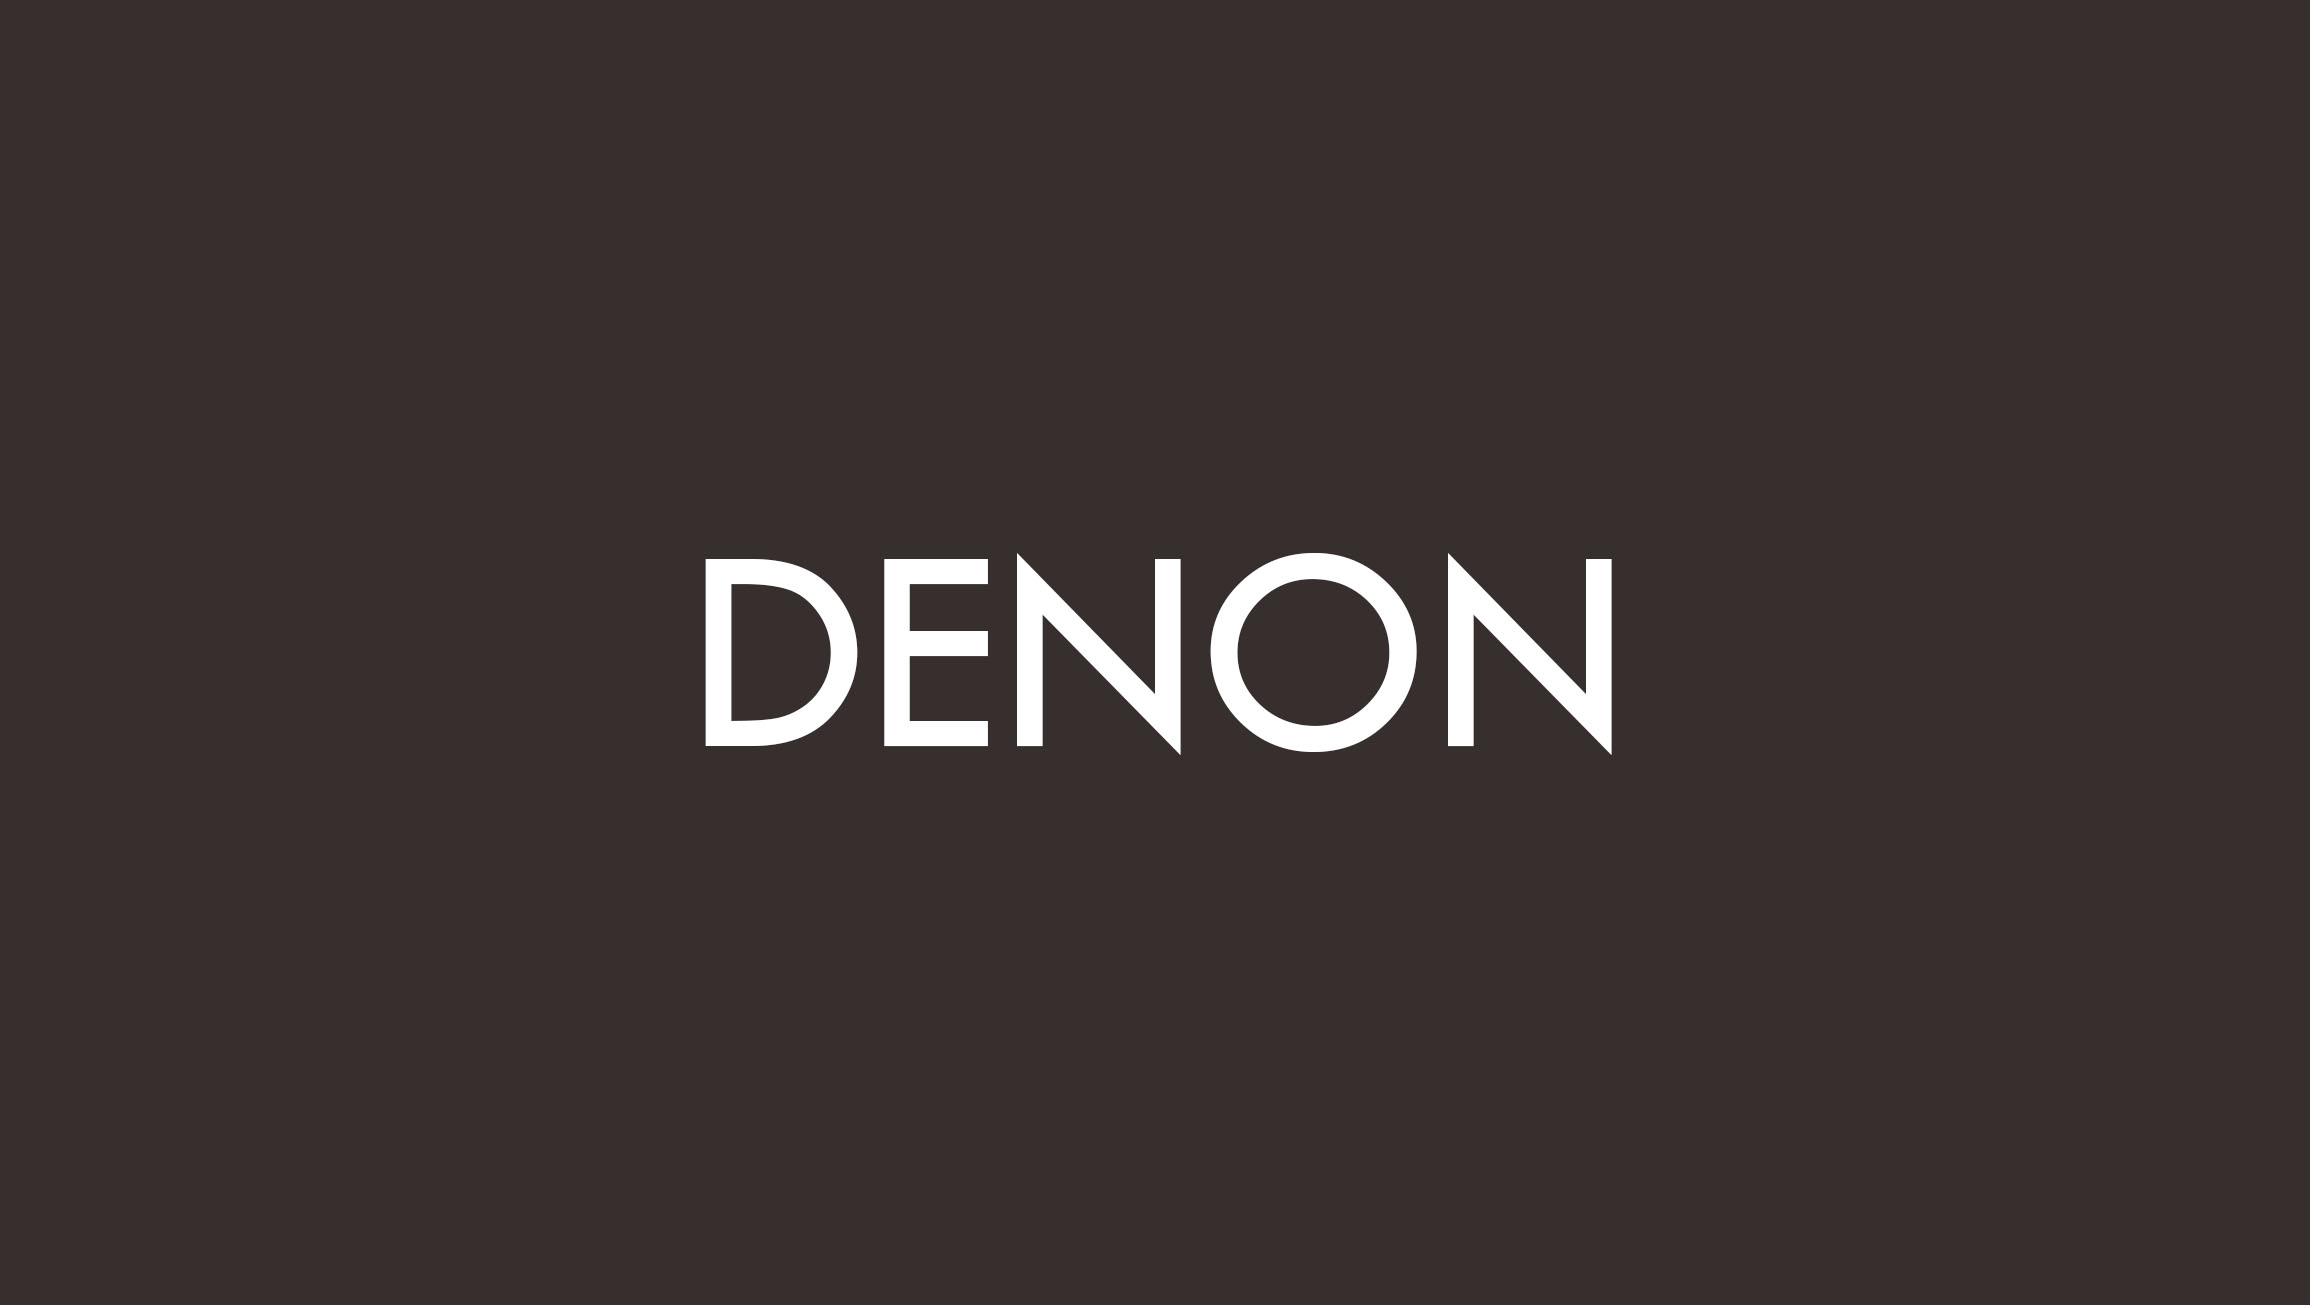 dennon